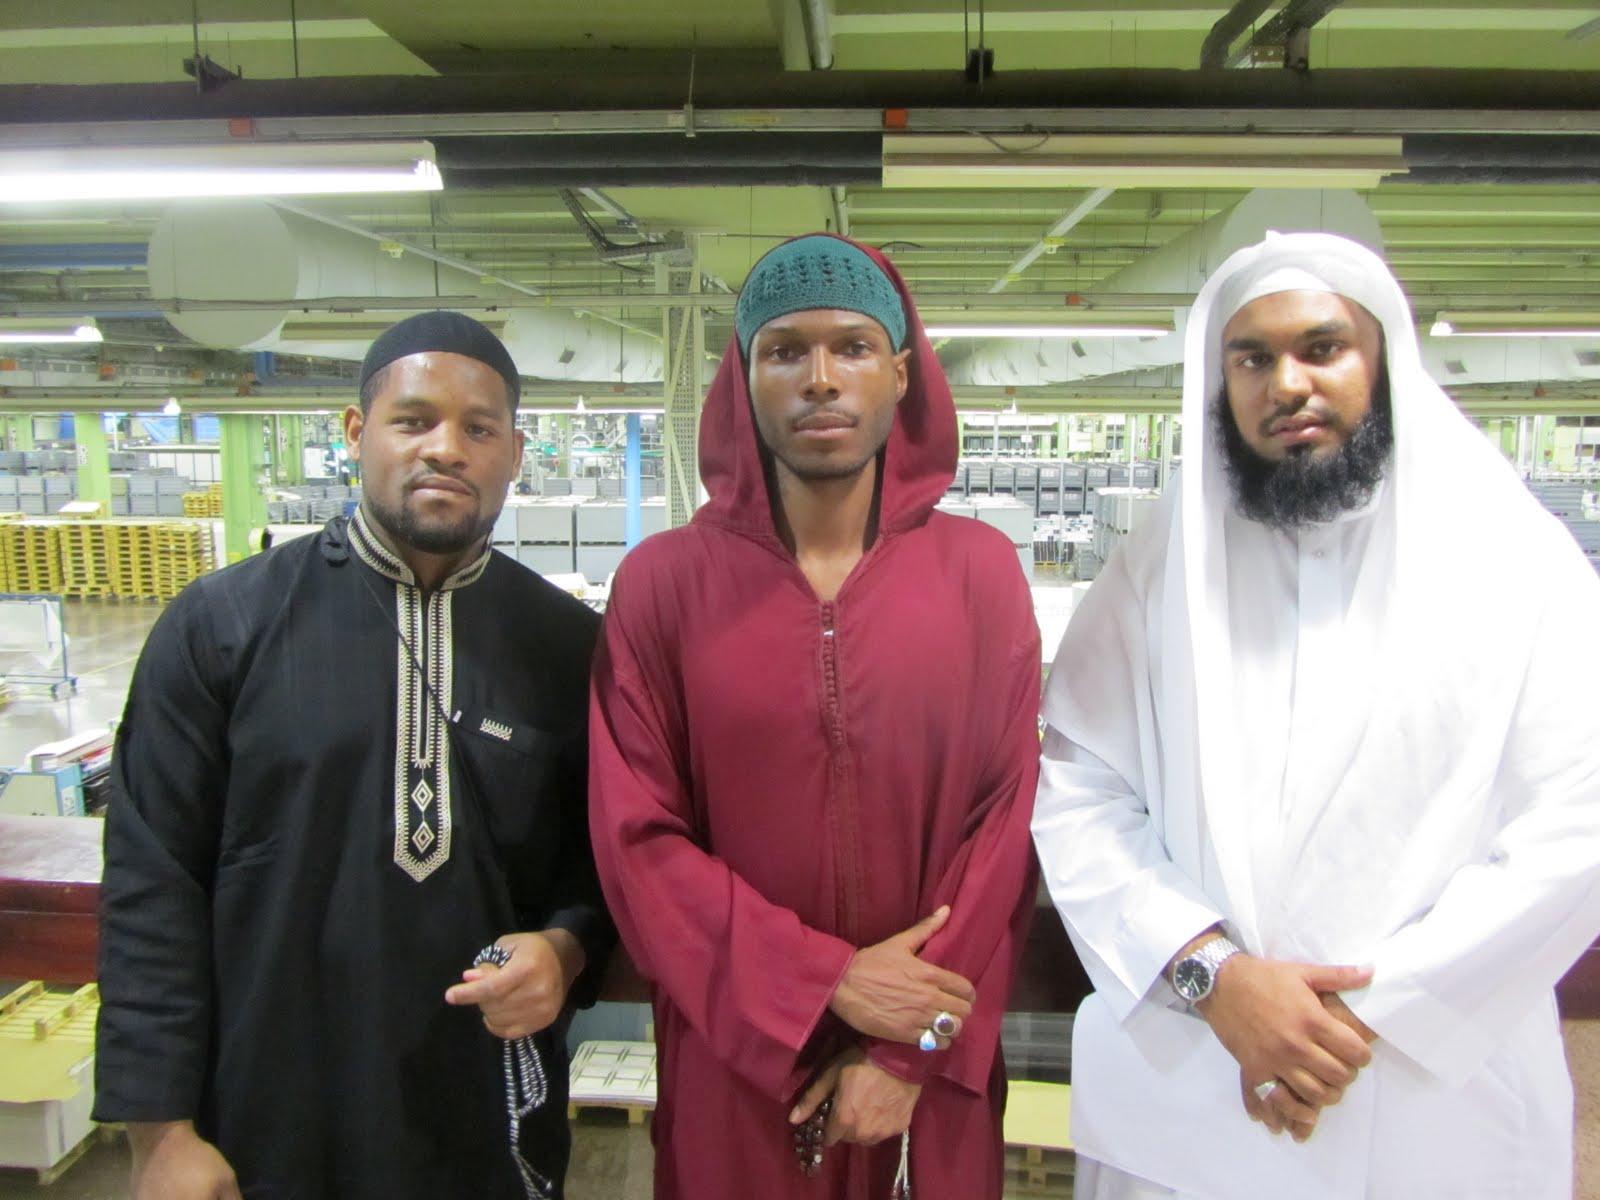 Malcolm Shabbazz petits fils de al-Hajj Malik Shabbaz, alias Malcolm X